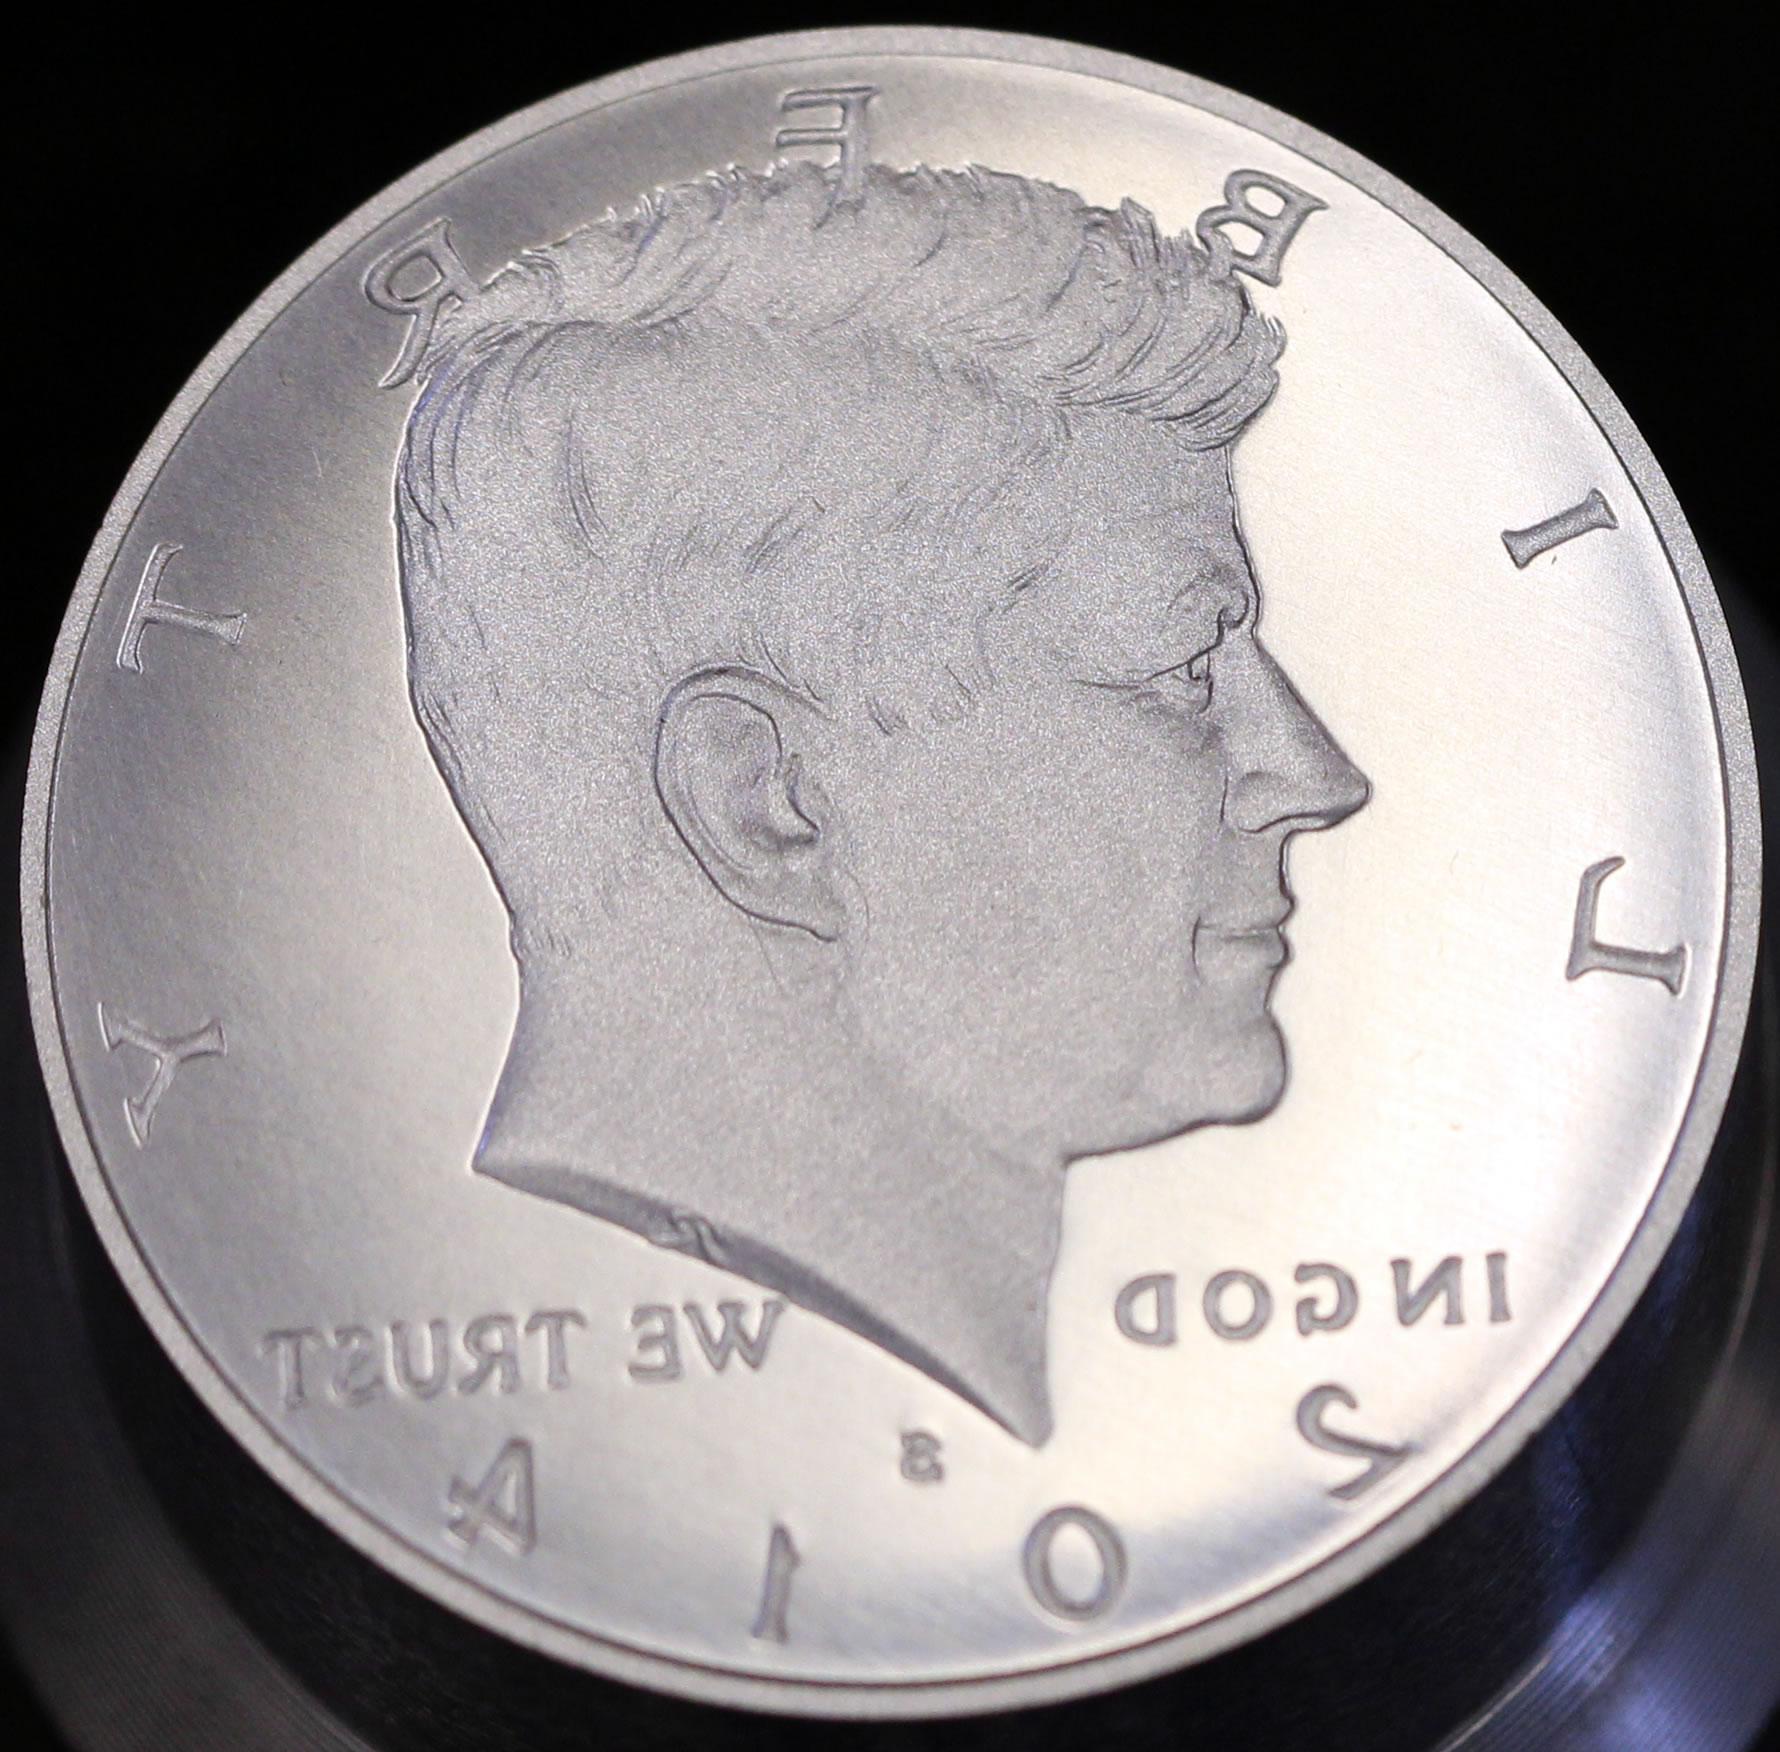 10 Dollar Silver Coin 2017